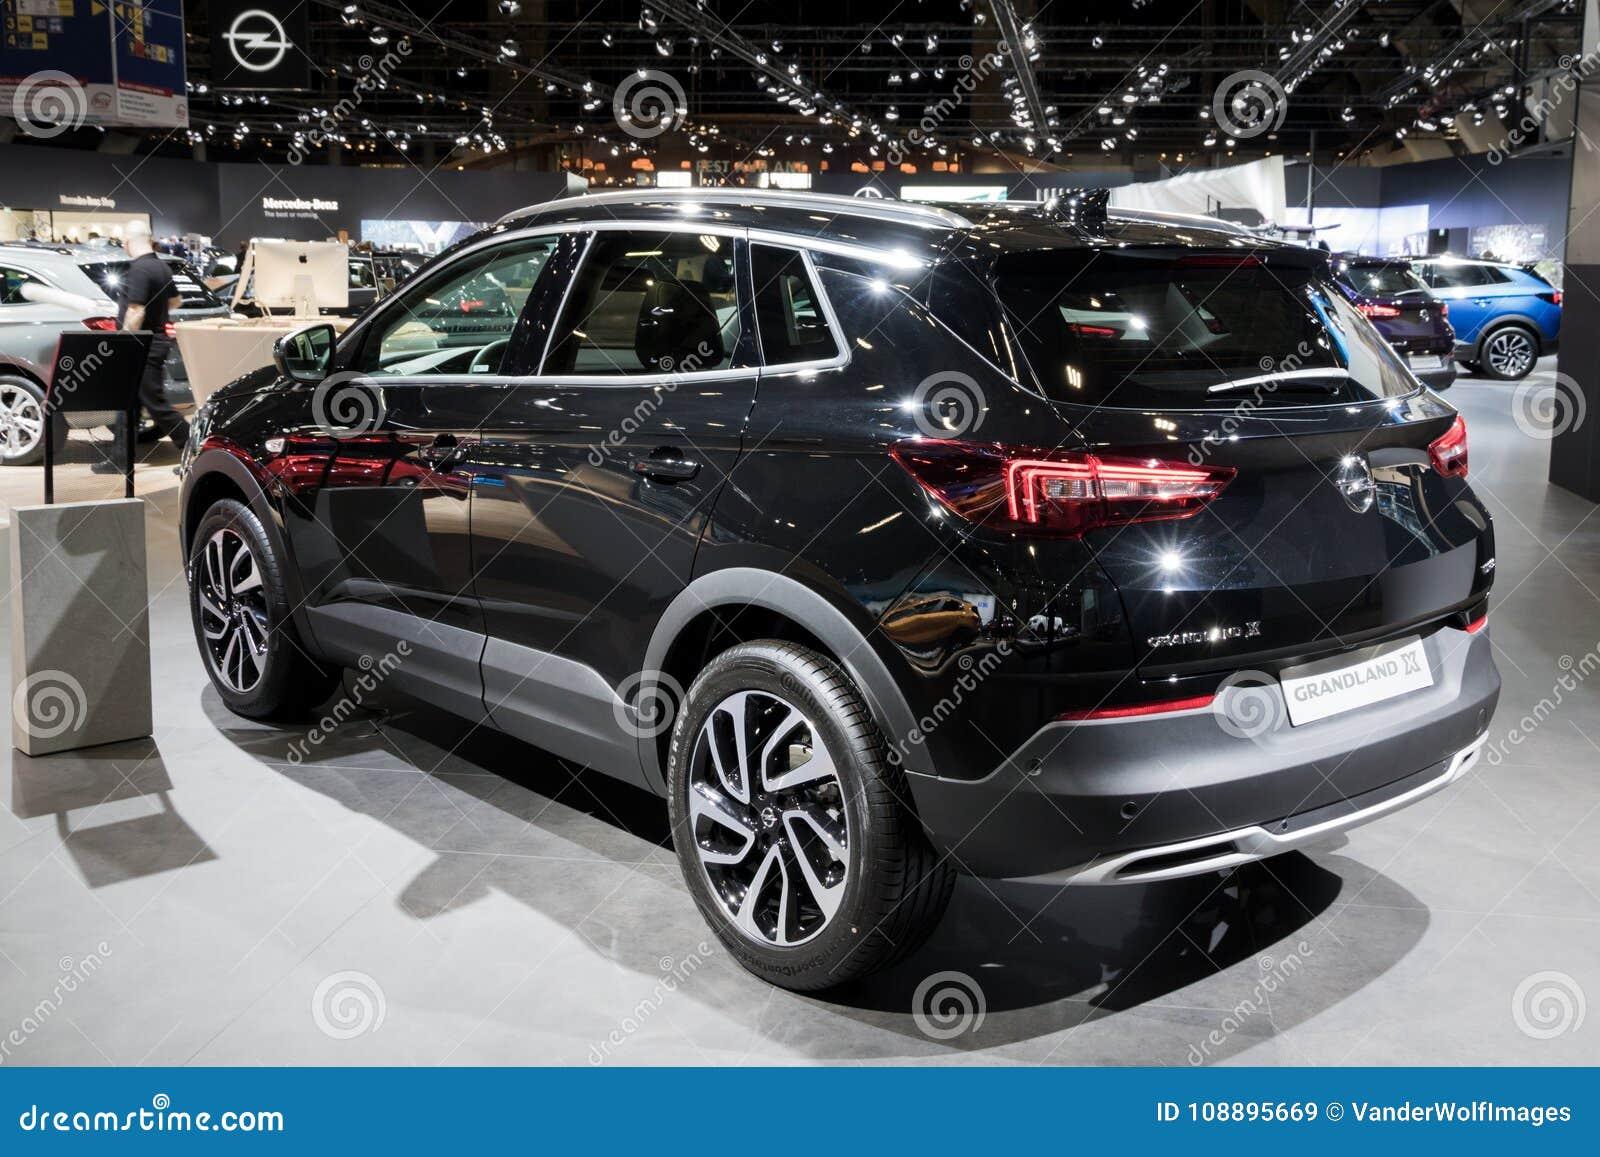 https www dreamstime com brussels jan opel grandland new suv car shown brussels motor show new opel grandland suv car image108895669